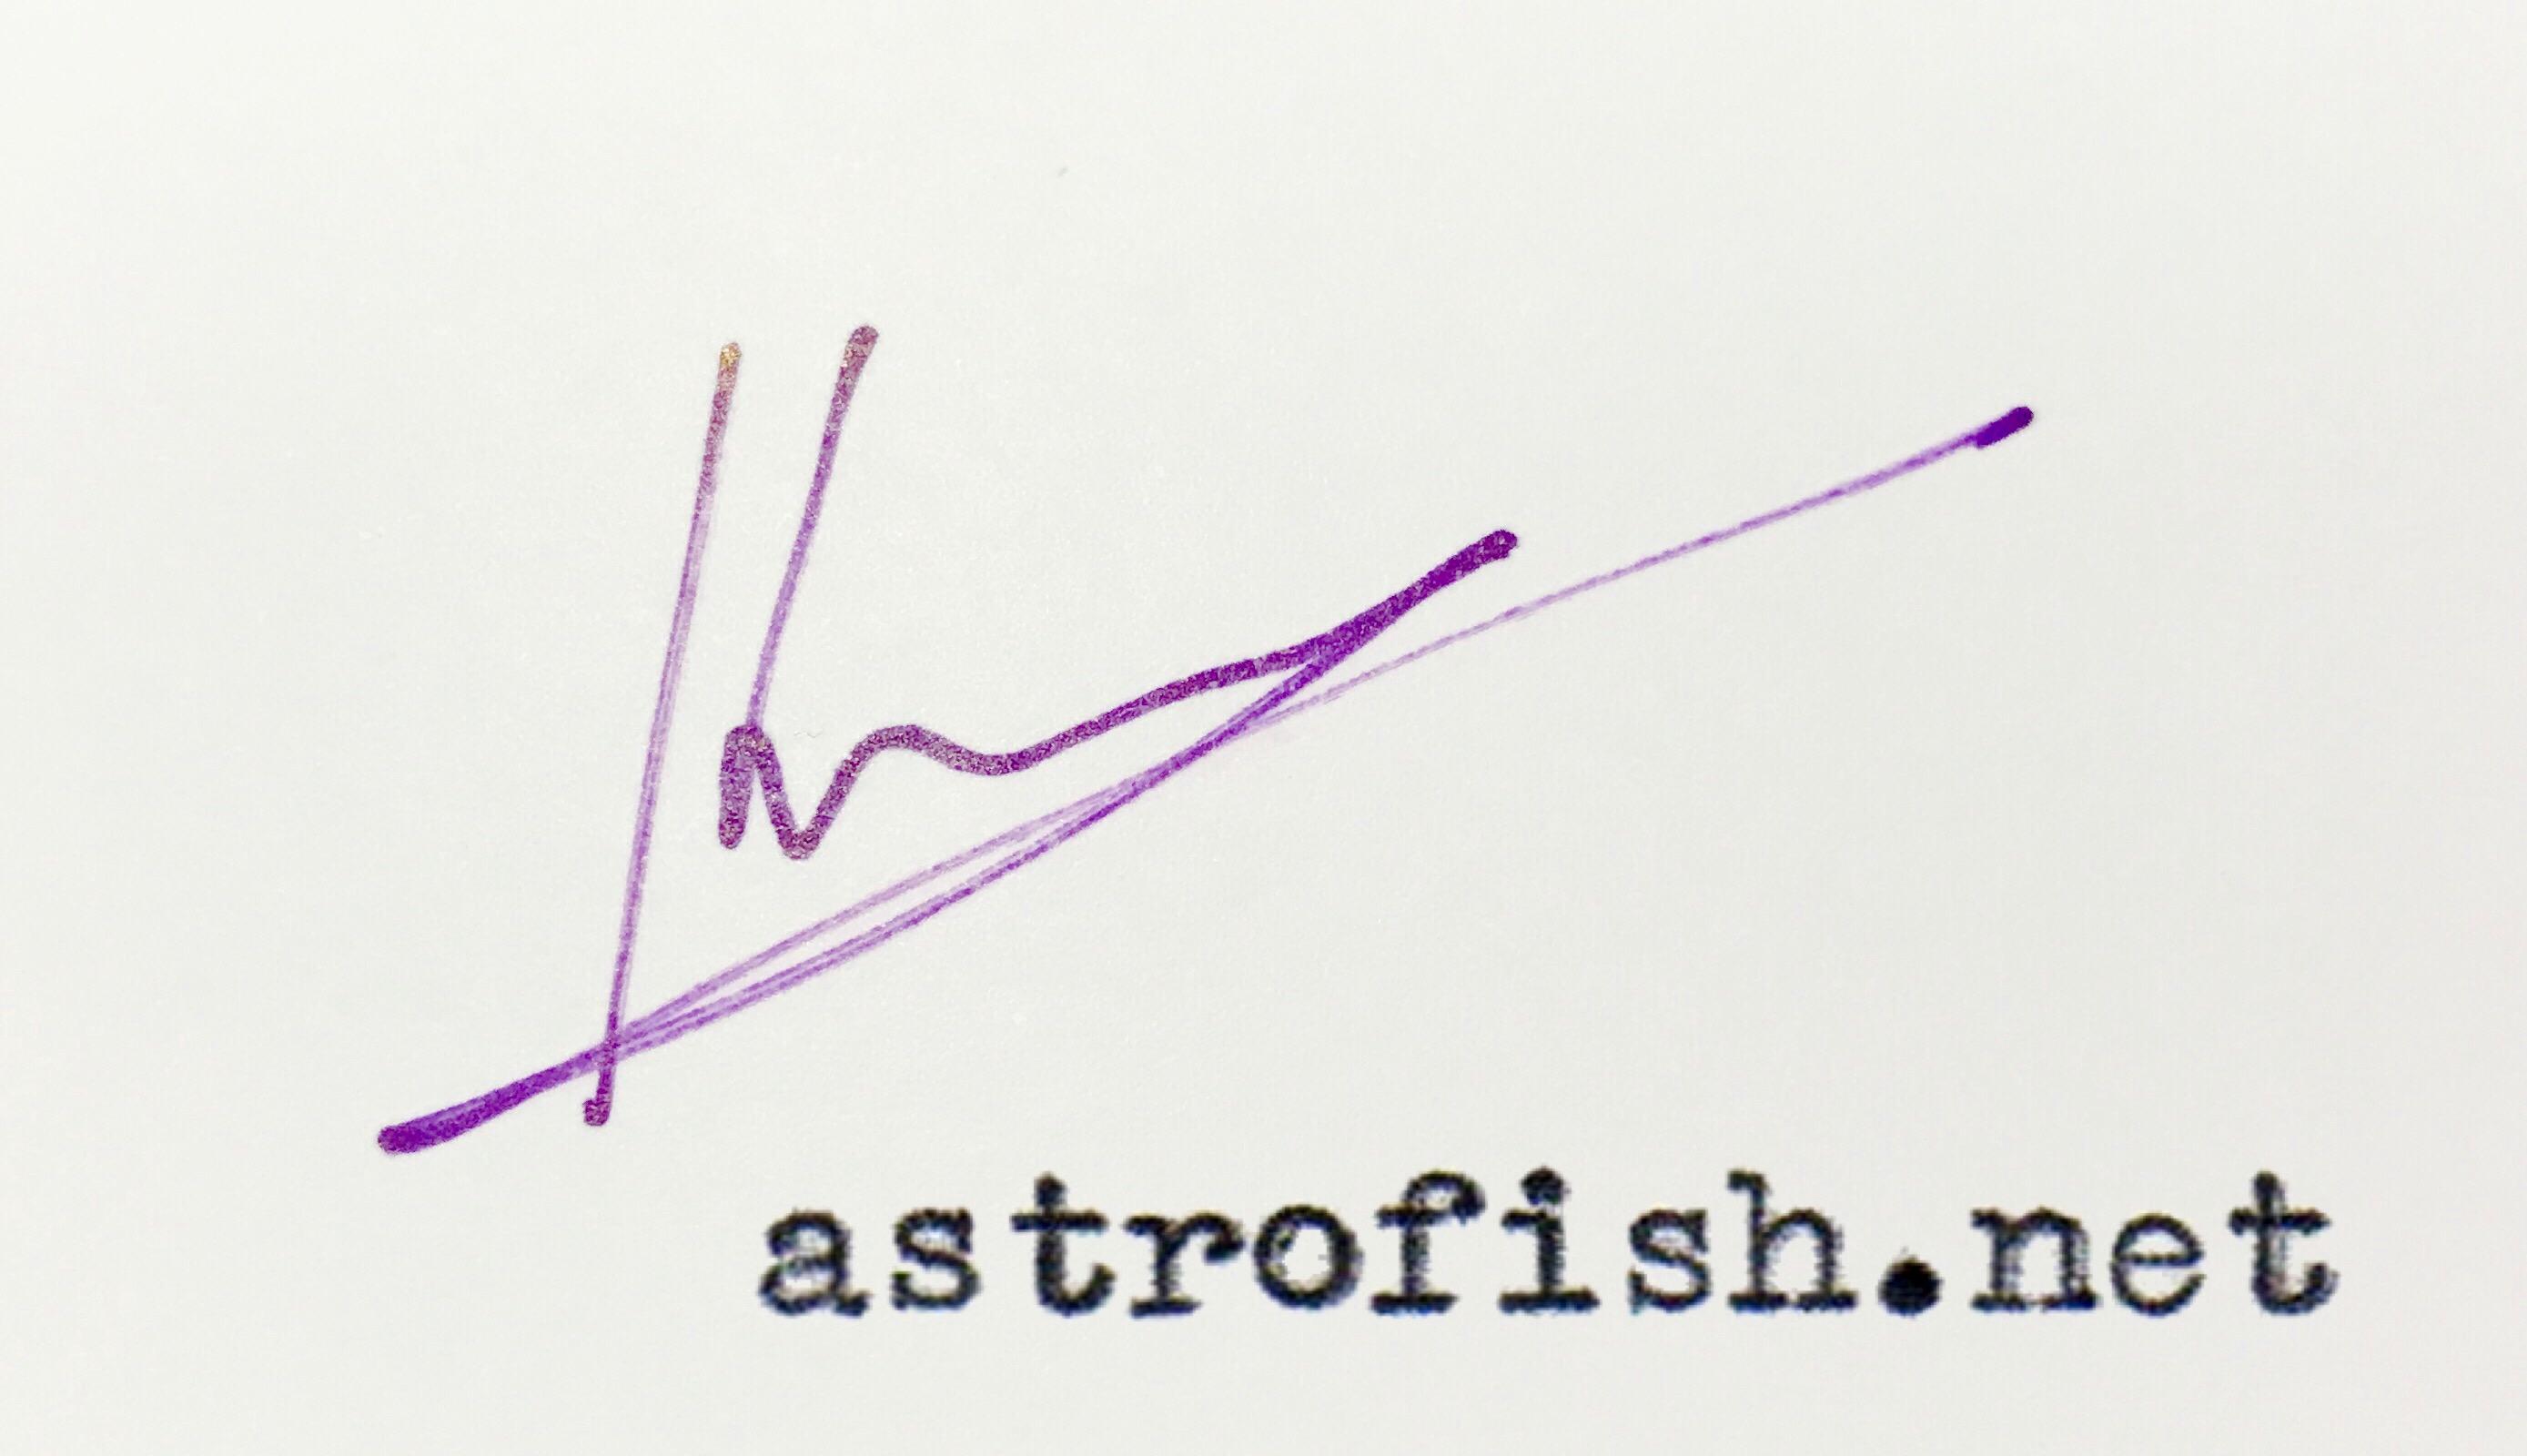 astrofish.net sig